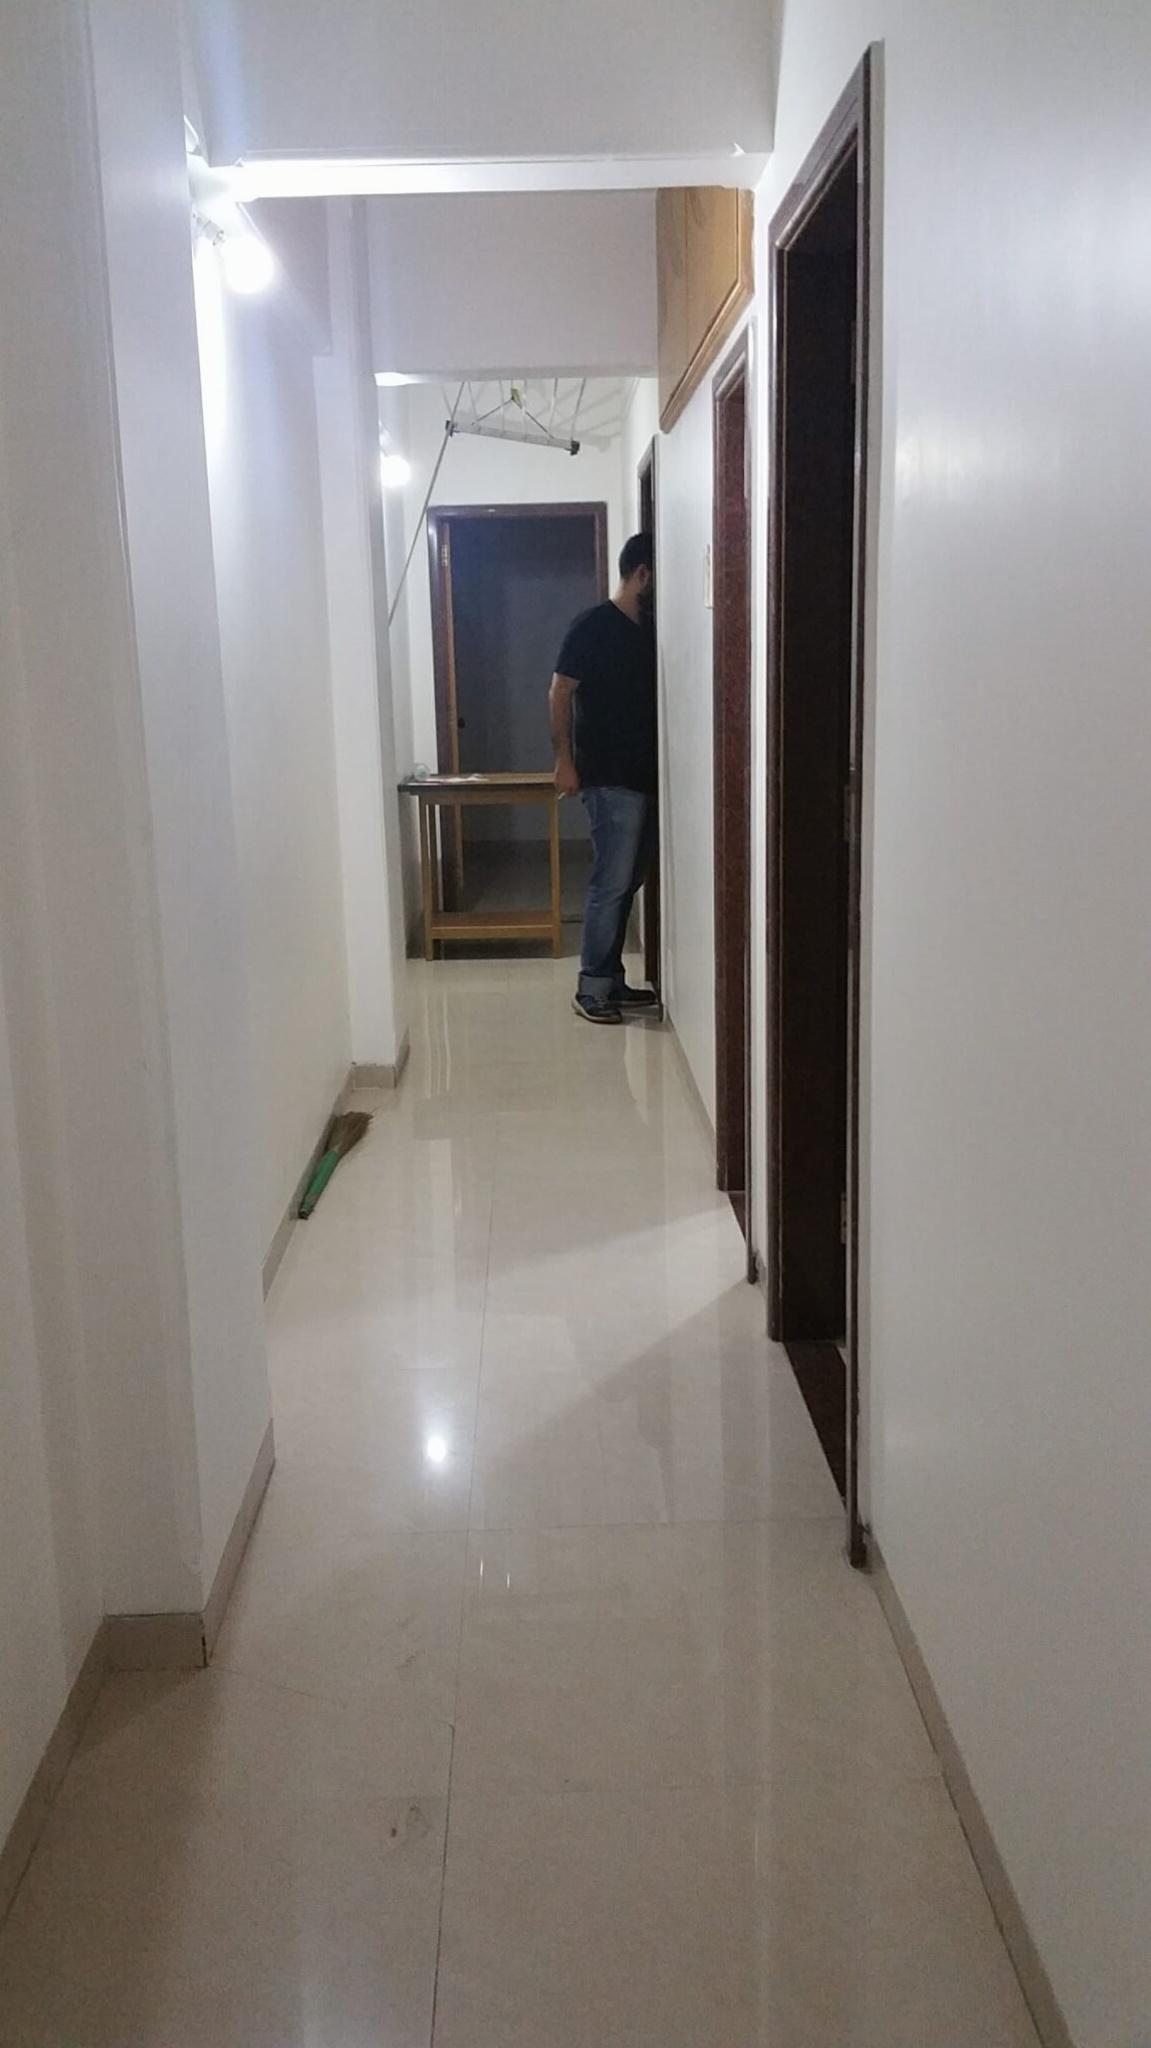 2 Bedroom Serviced Apartment in Kandivali West, Mumbai ...